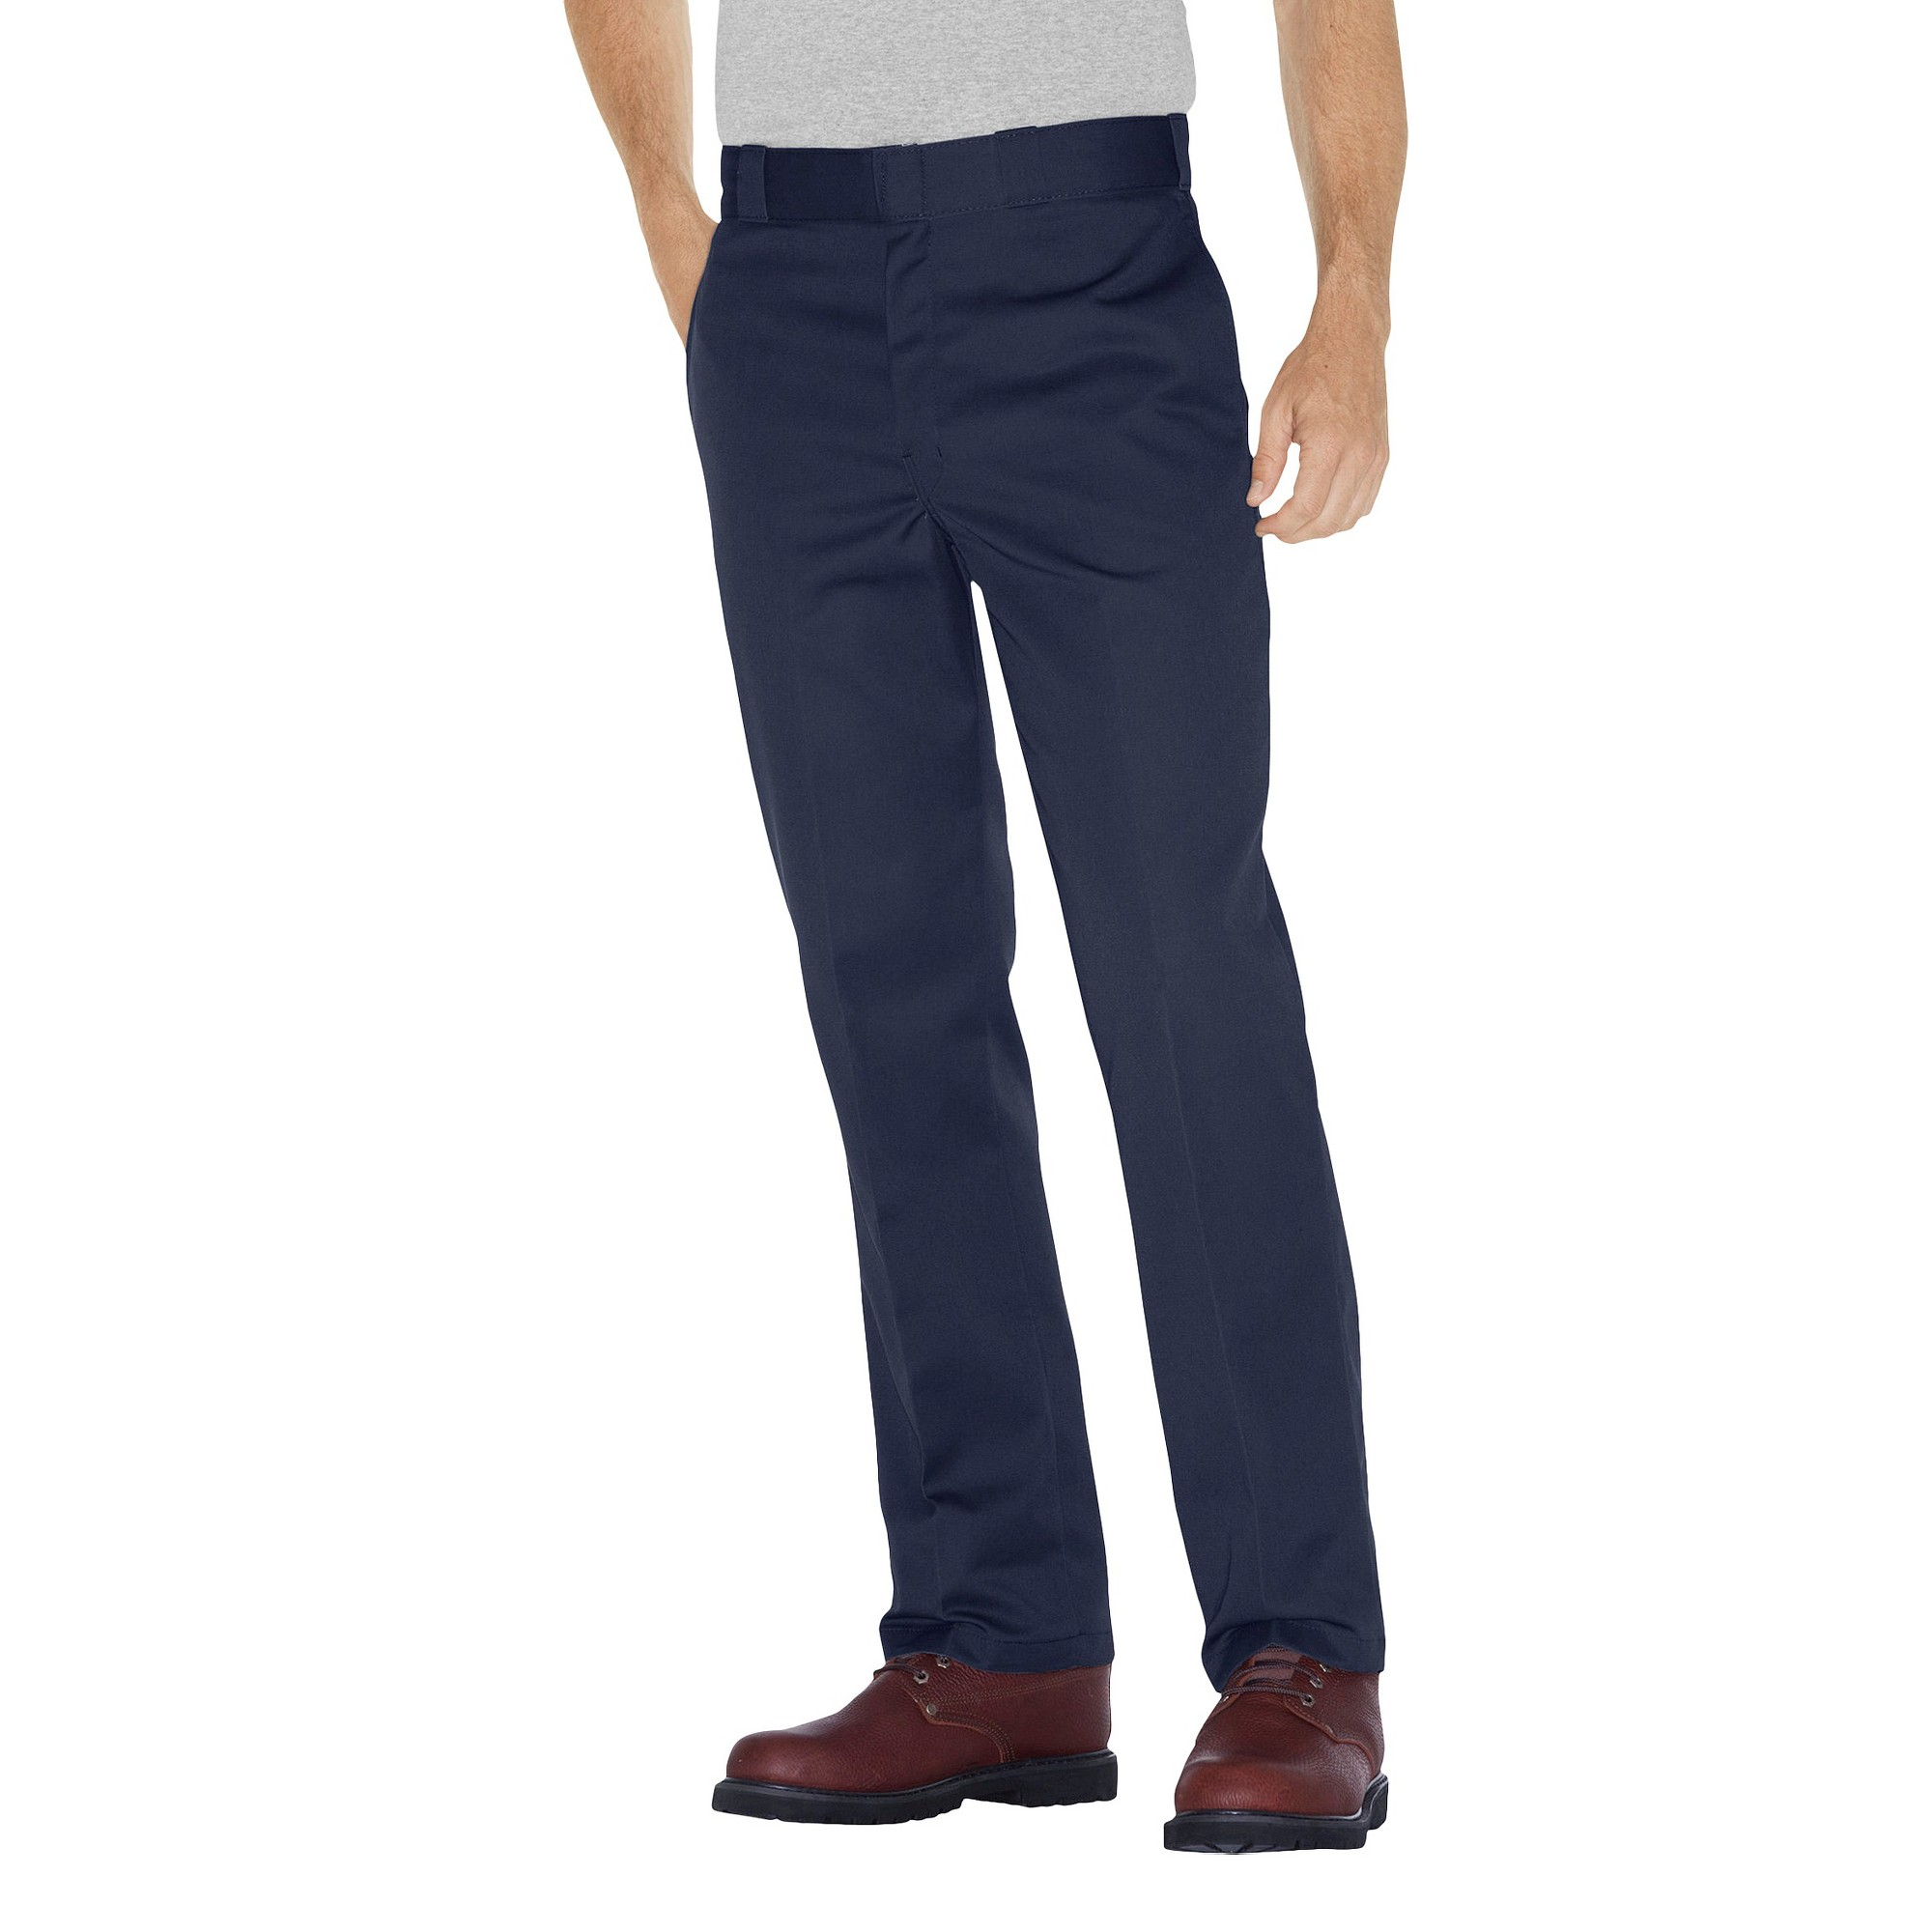 Dickies Men's Original Fit 874 Twill Work Pants- Dark Navy 31x34, Dark Blue